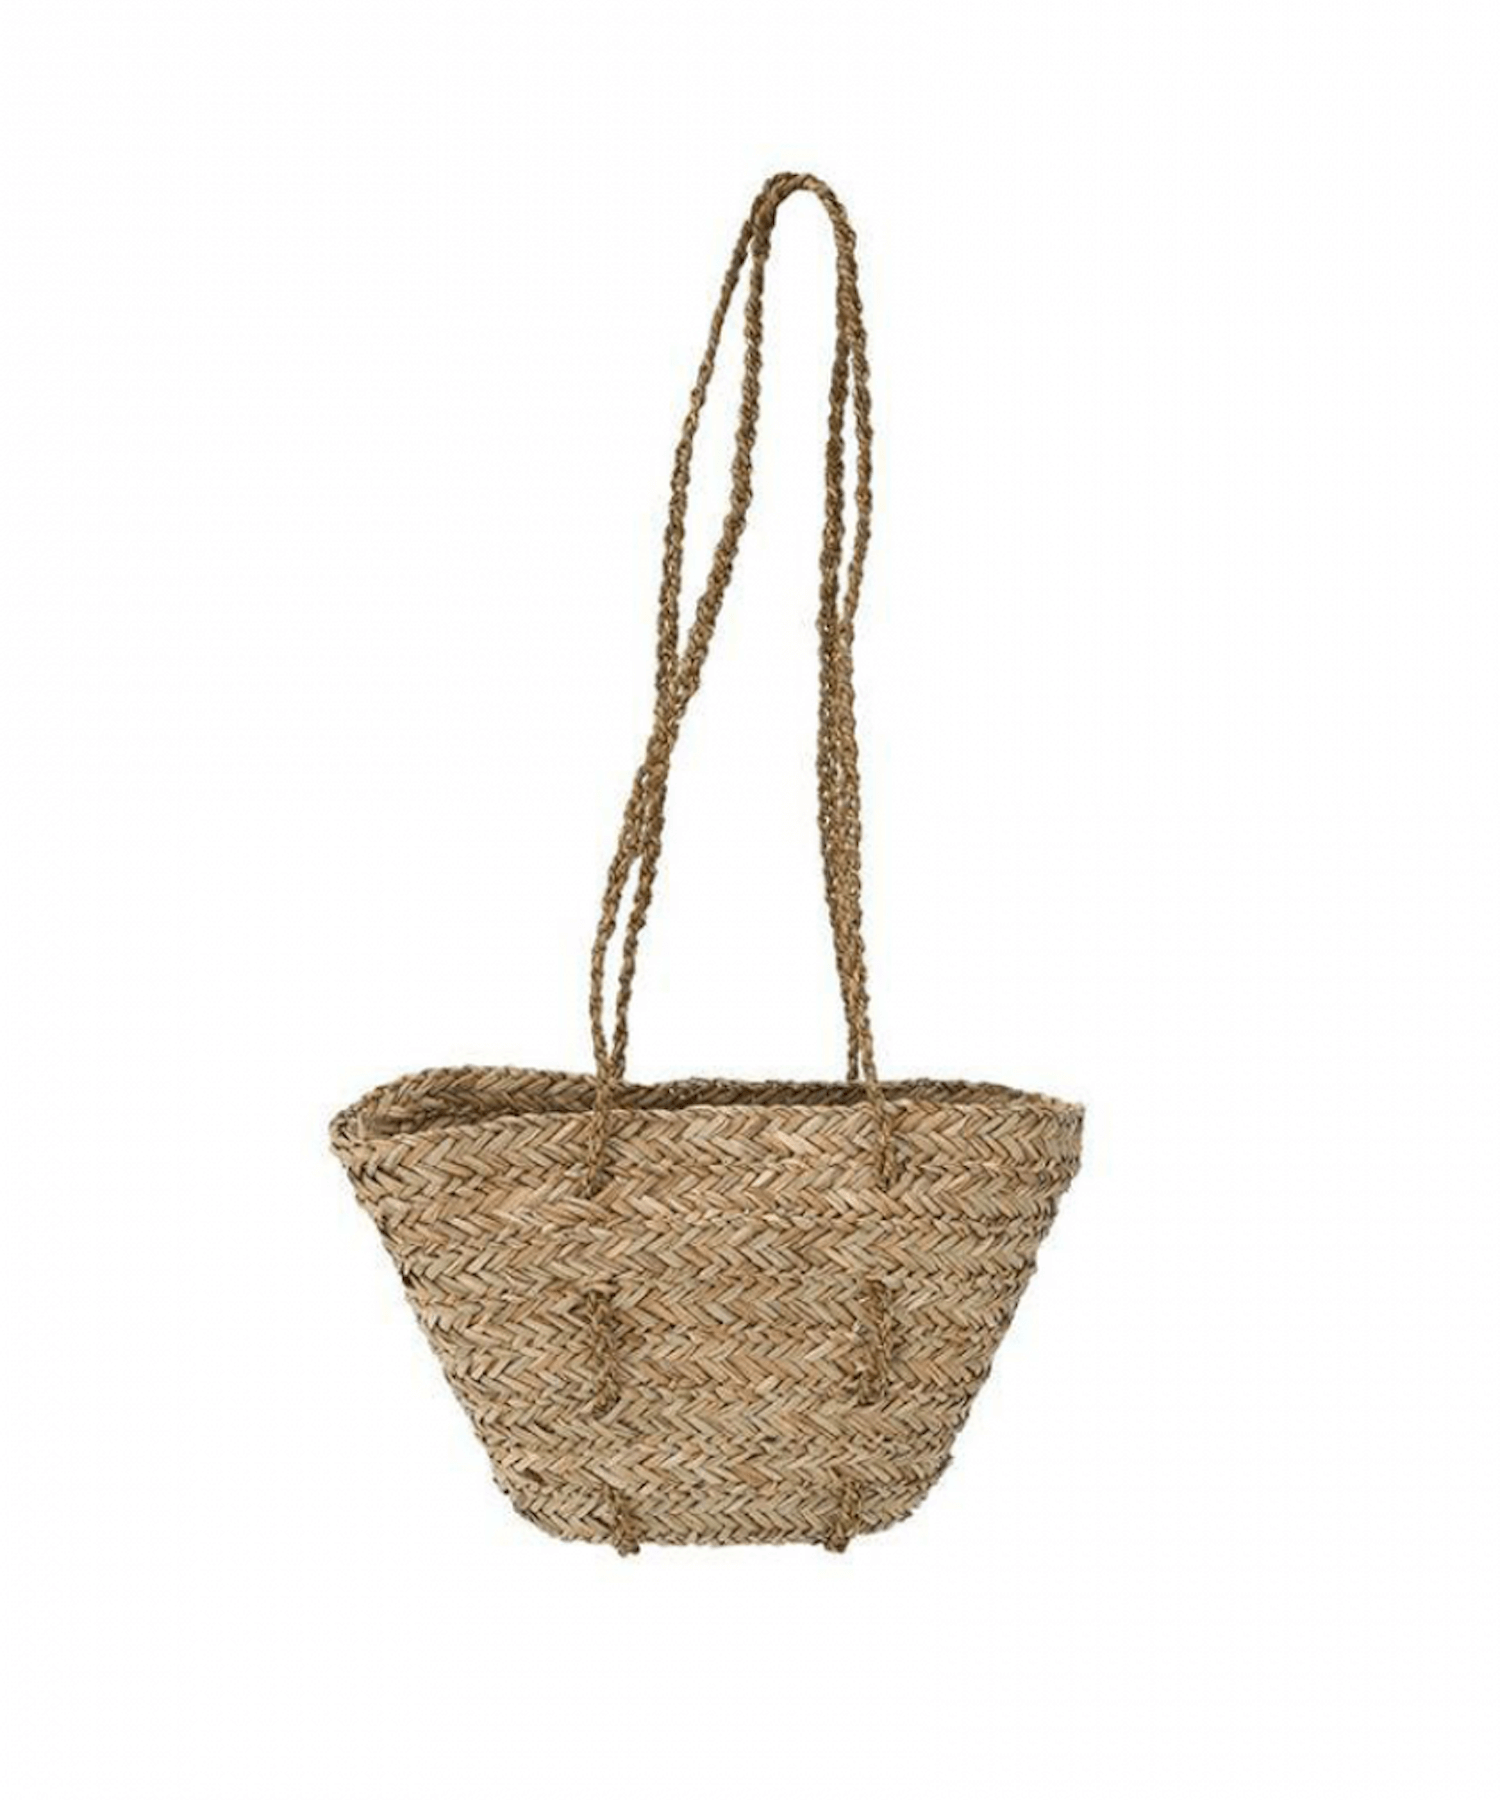 est living summer essentials Alterior Motif PoppyCo Escape Basket Large